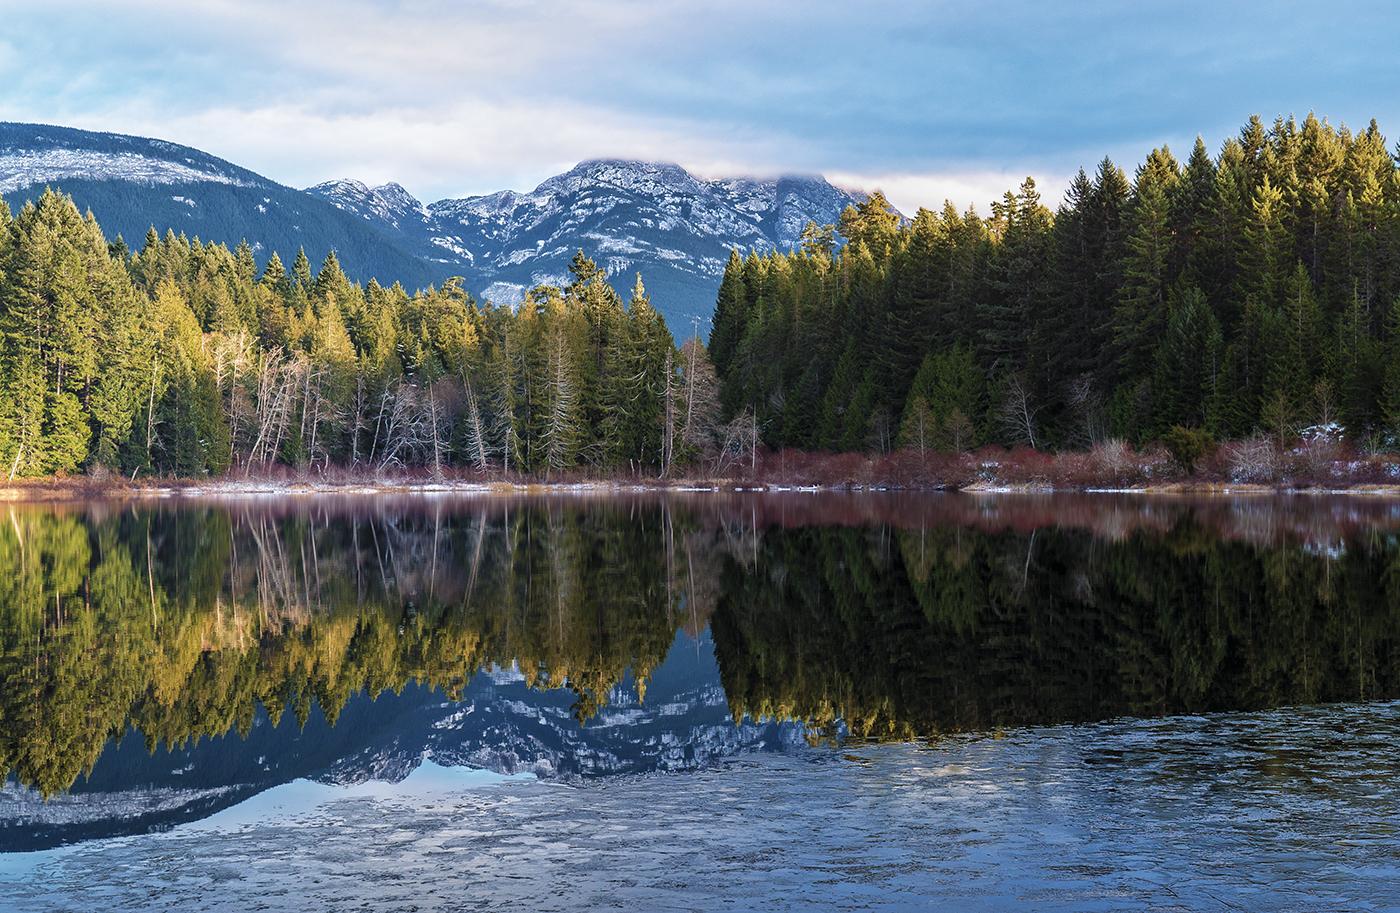 Icy Loon Lake